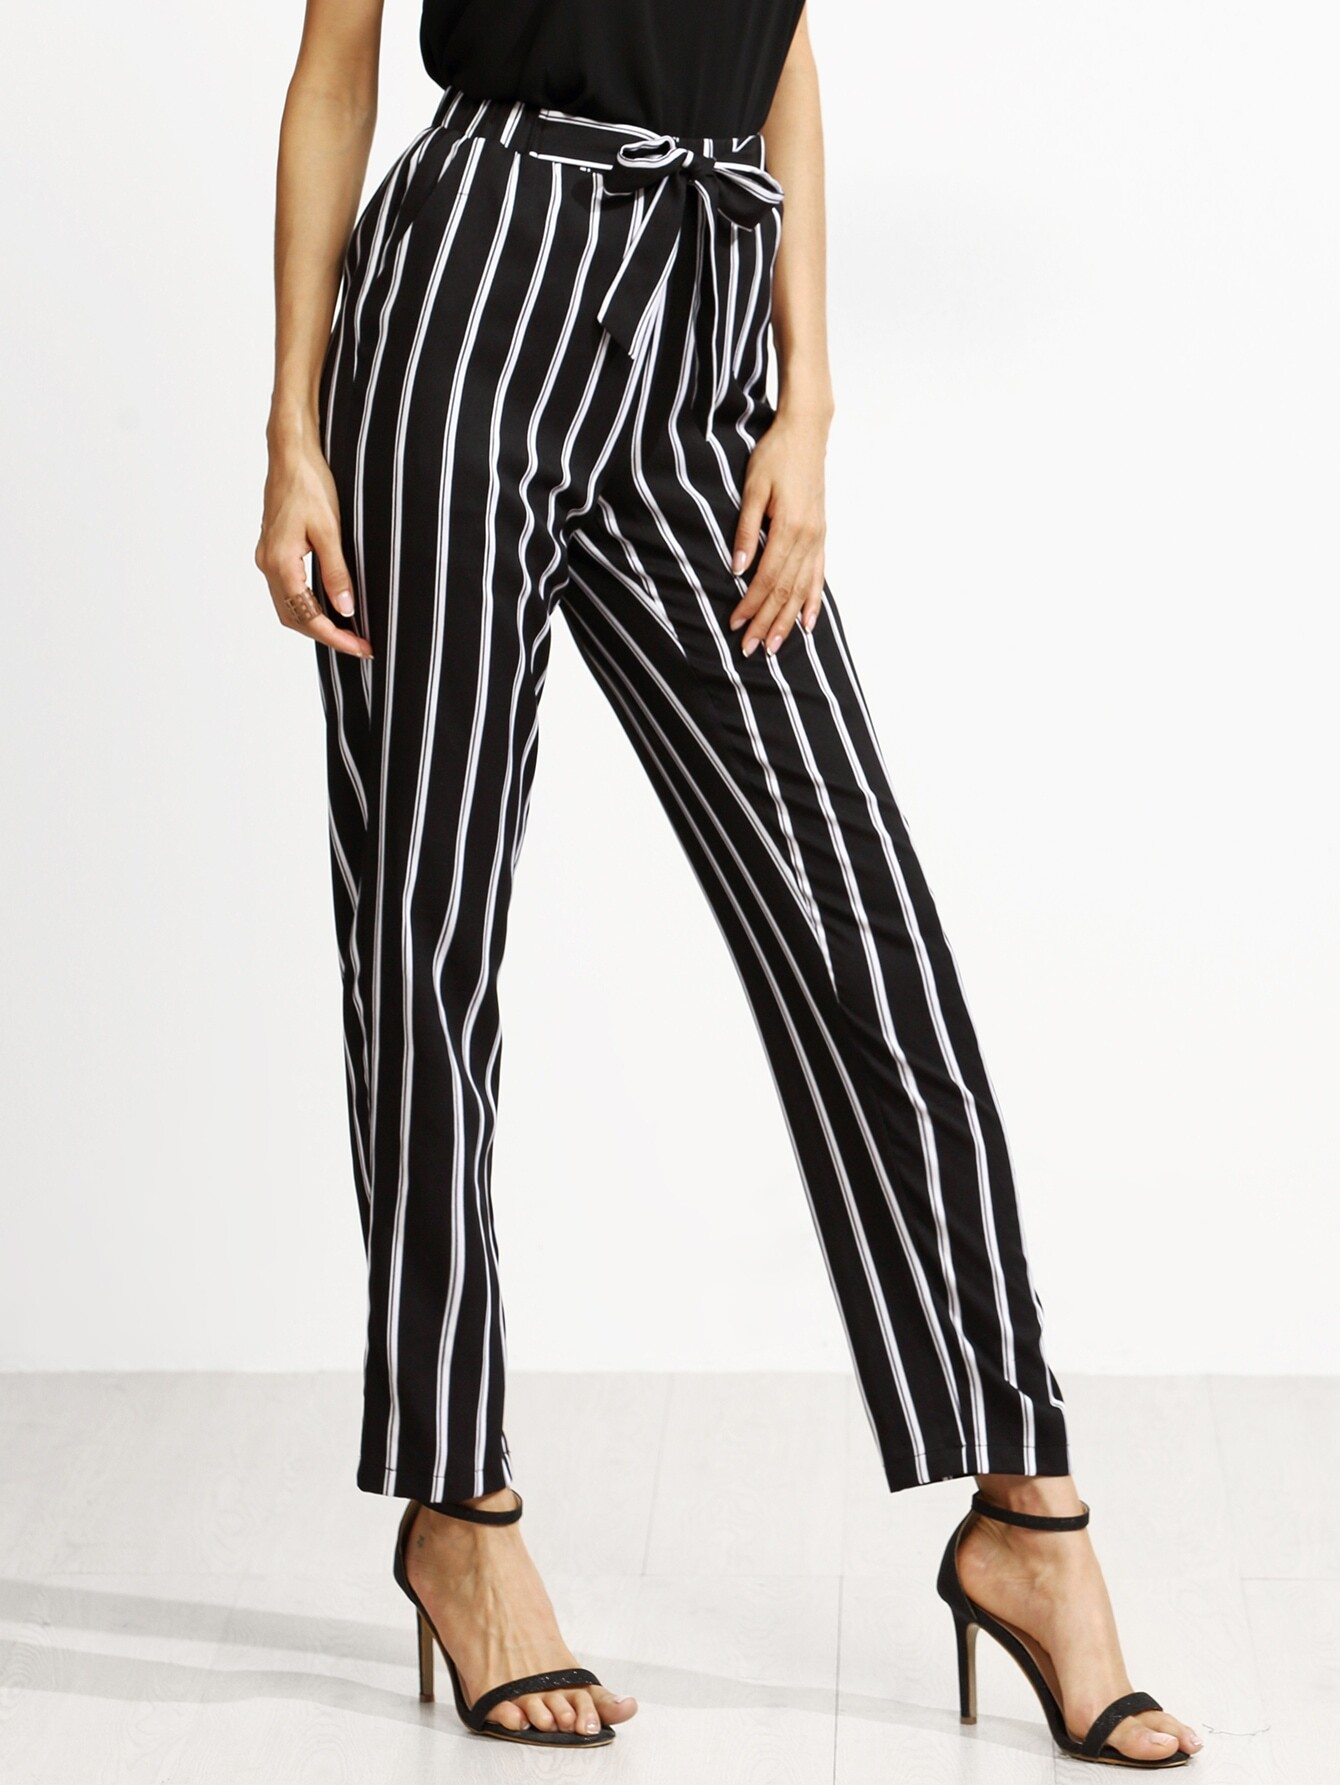 Black Vertical Striped Self Tie Pants -SheIn(Sheinside)